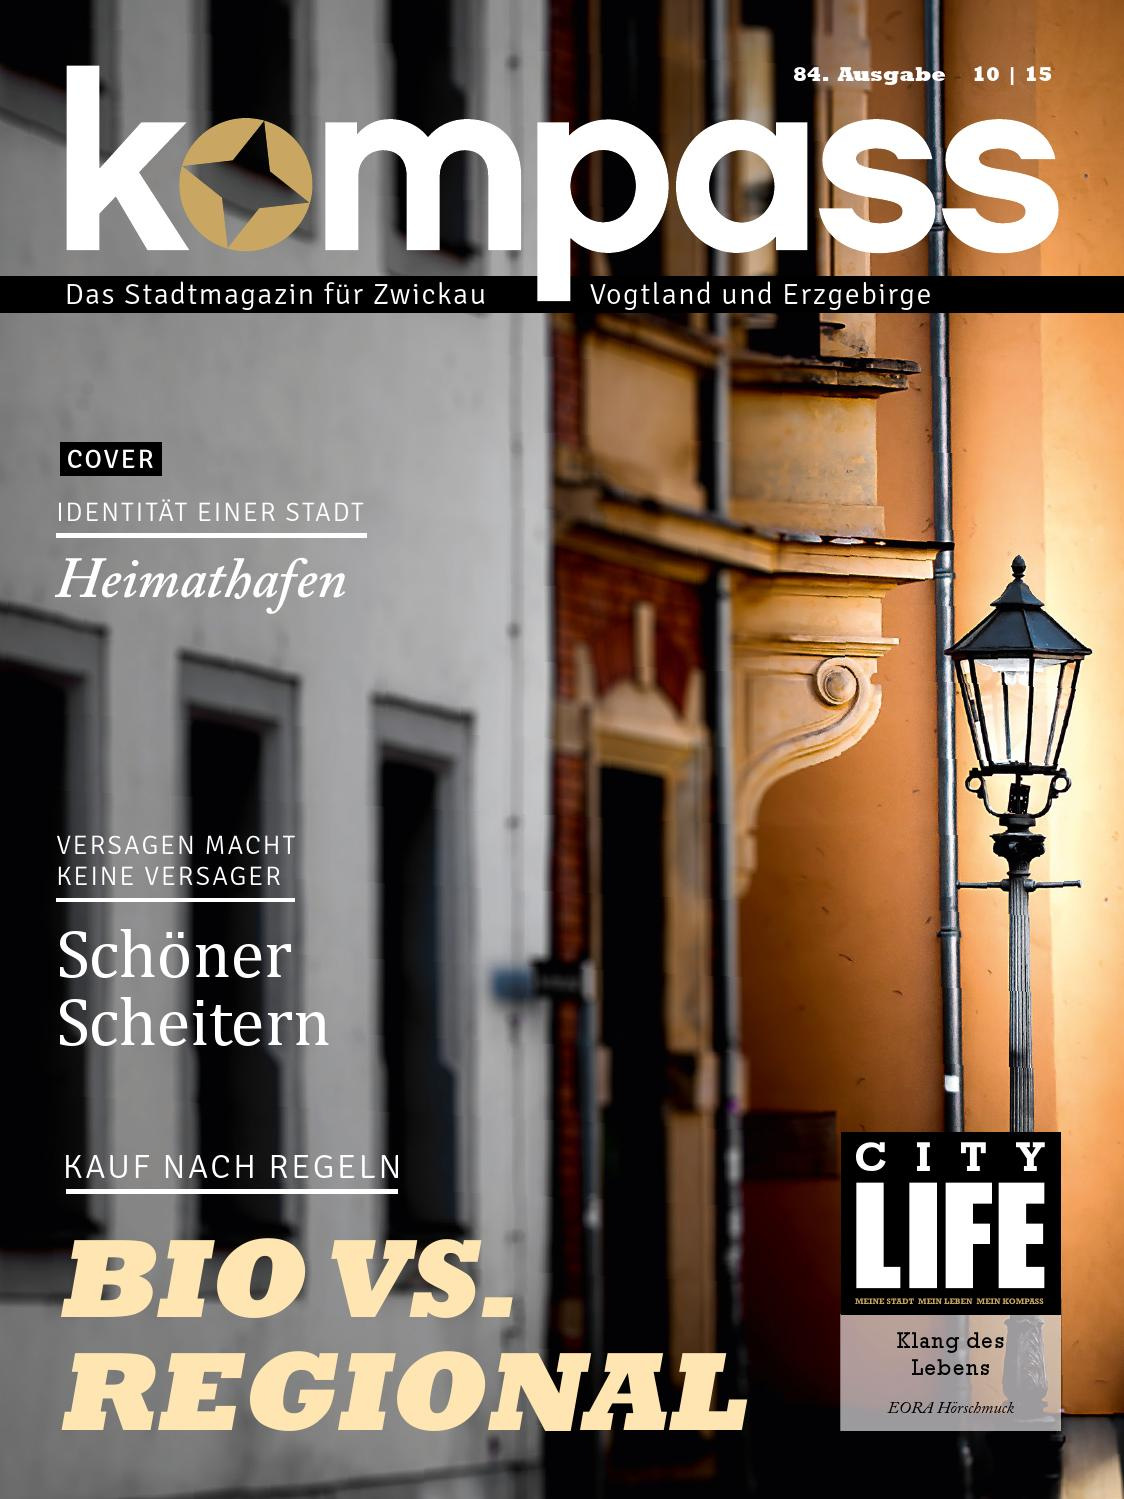 KOMPASS Stadtmagazin Ausgabe 10 | 15 By KOMPASS Stadtmagazin   Issuu